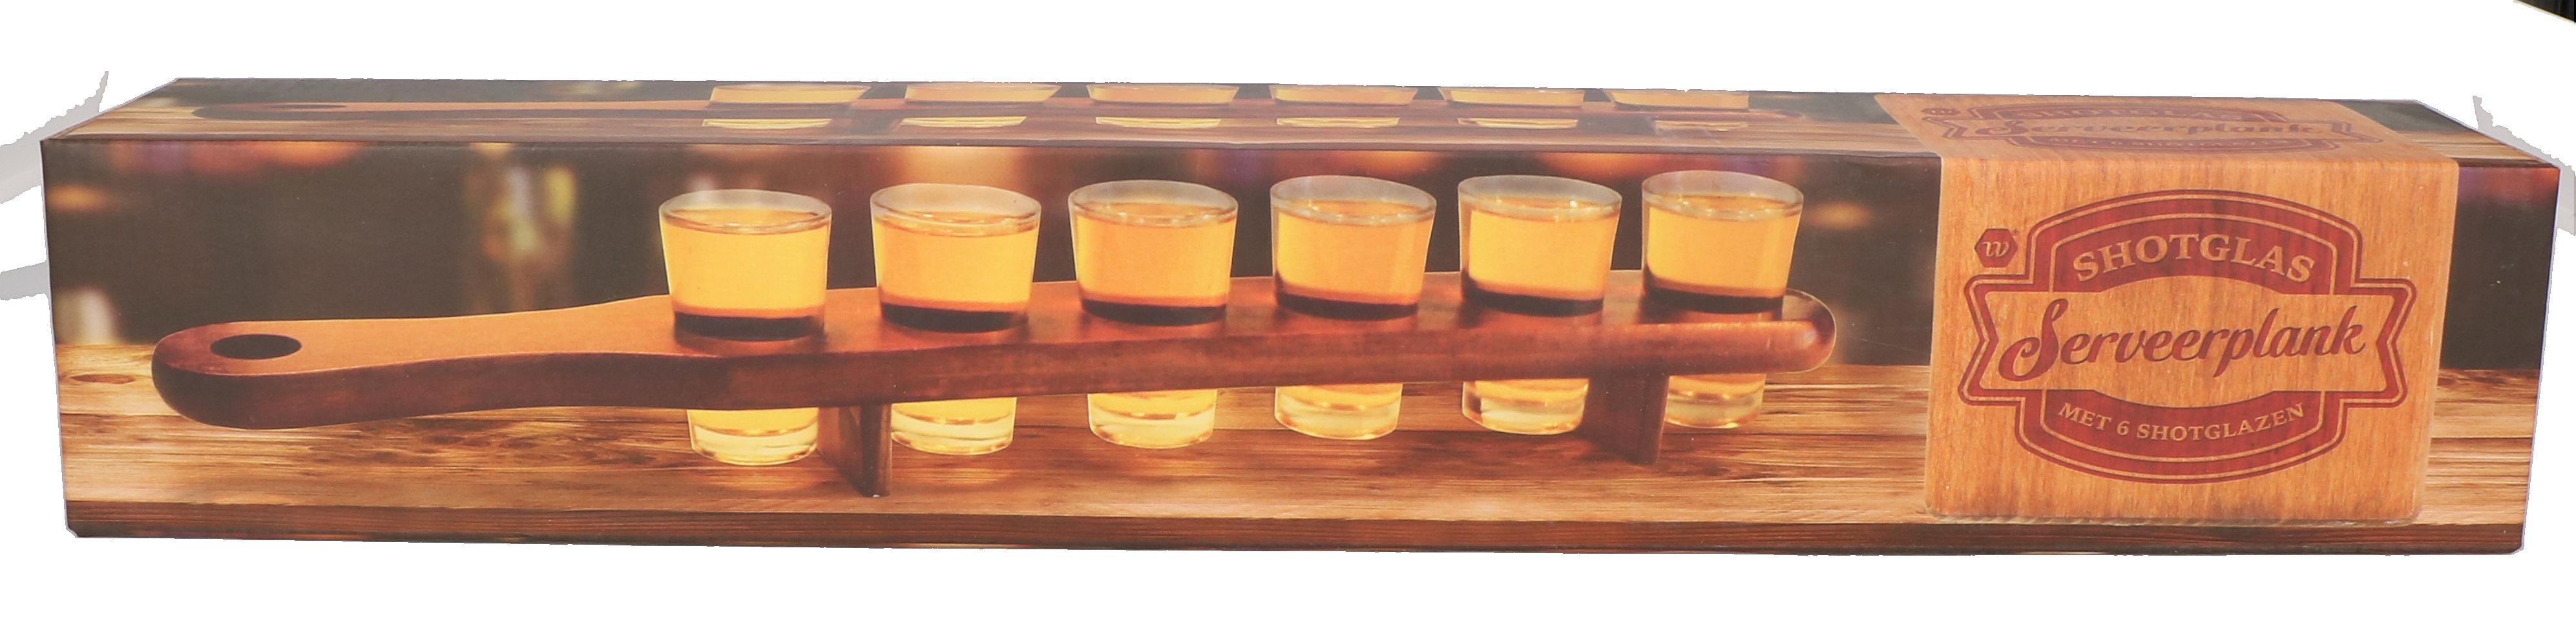 Shot glas plank met shotglazen